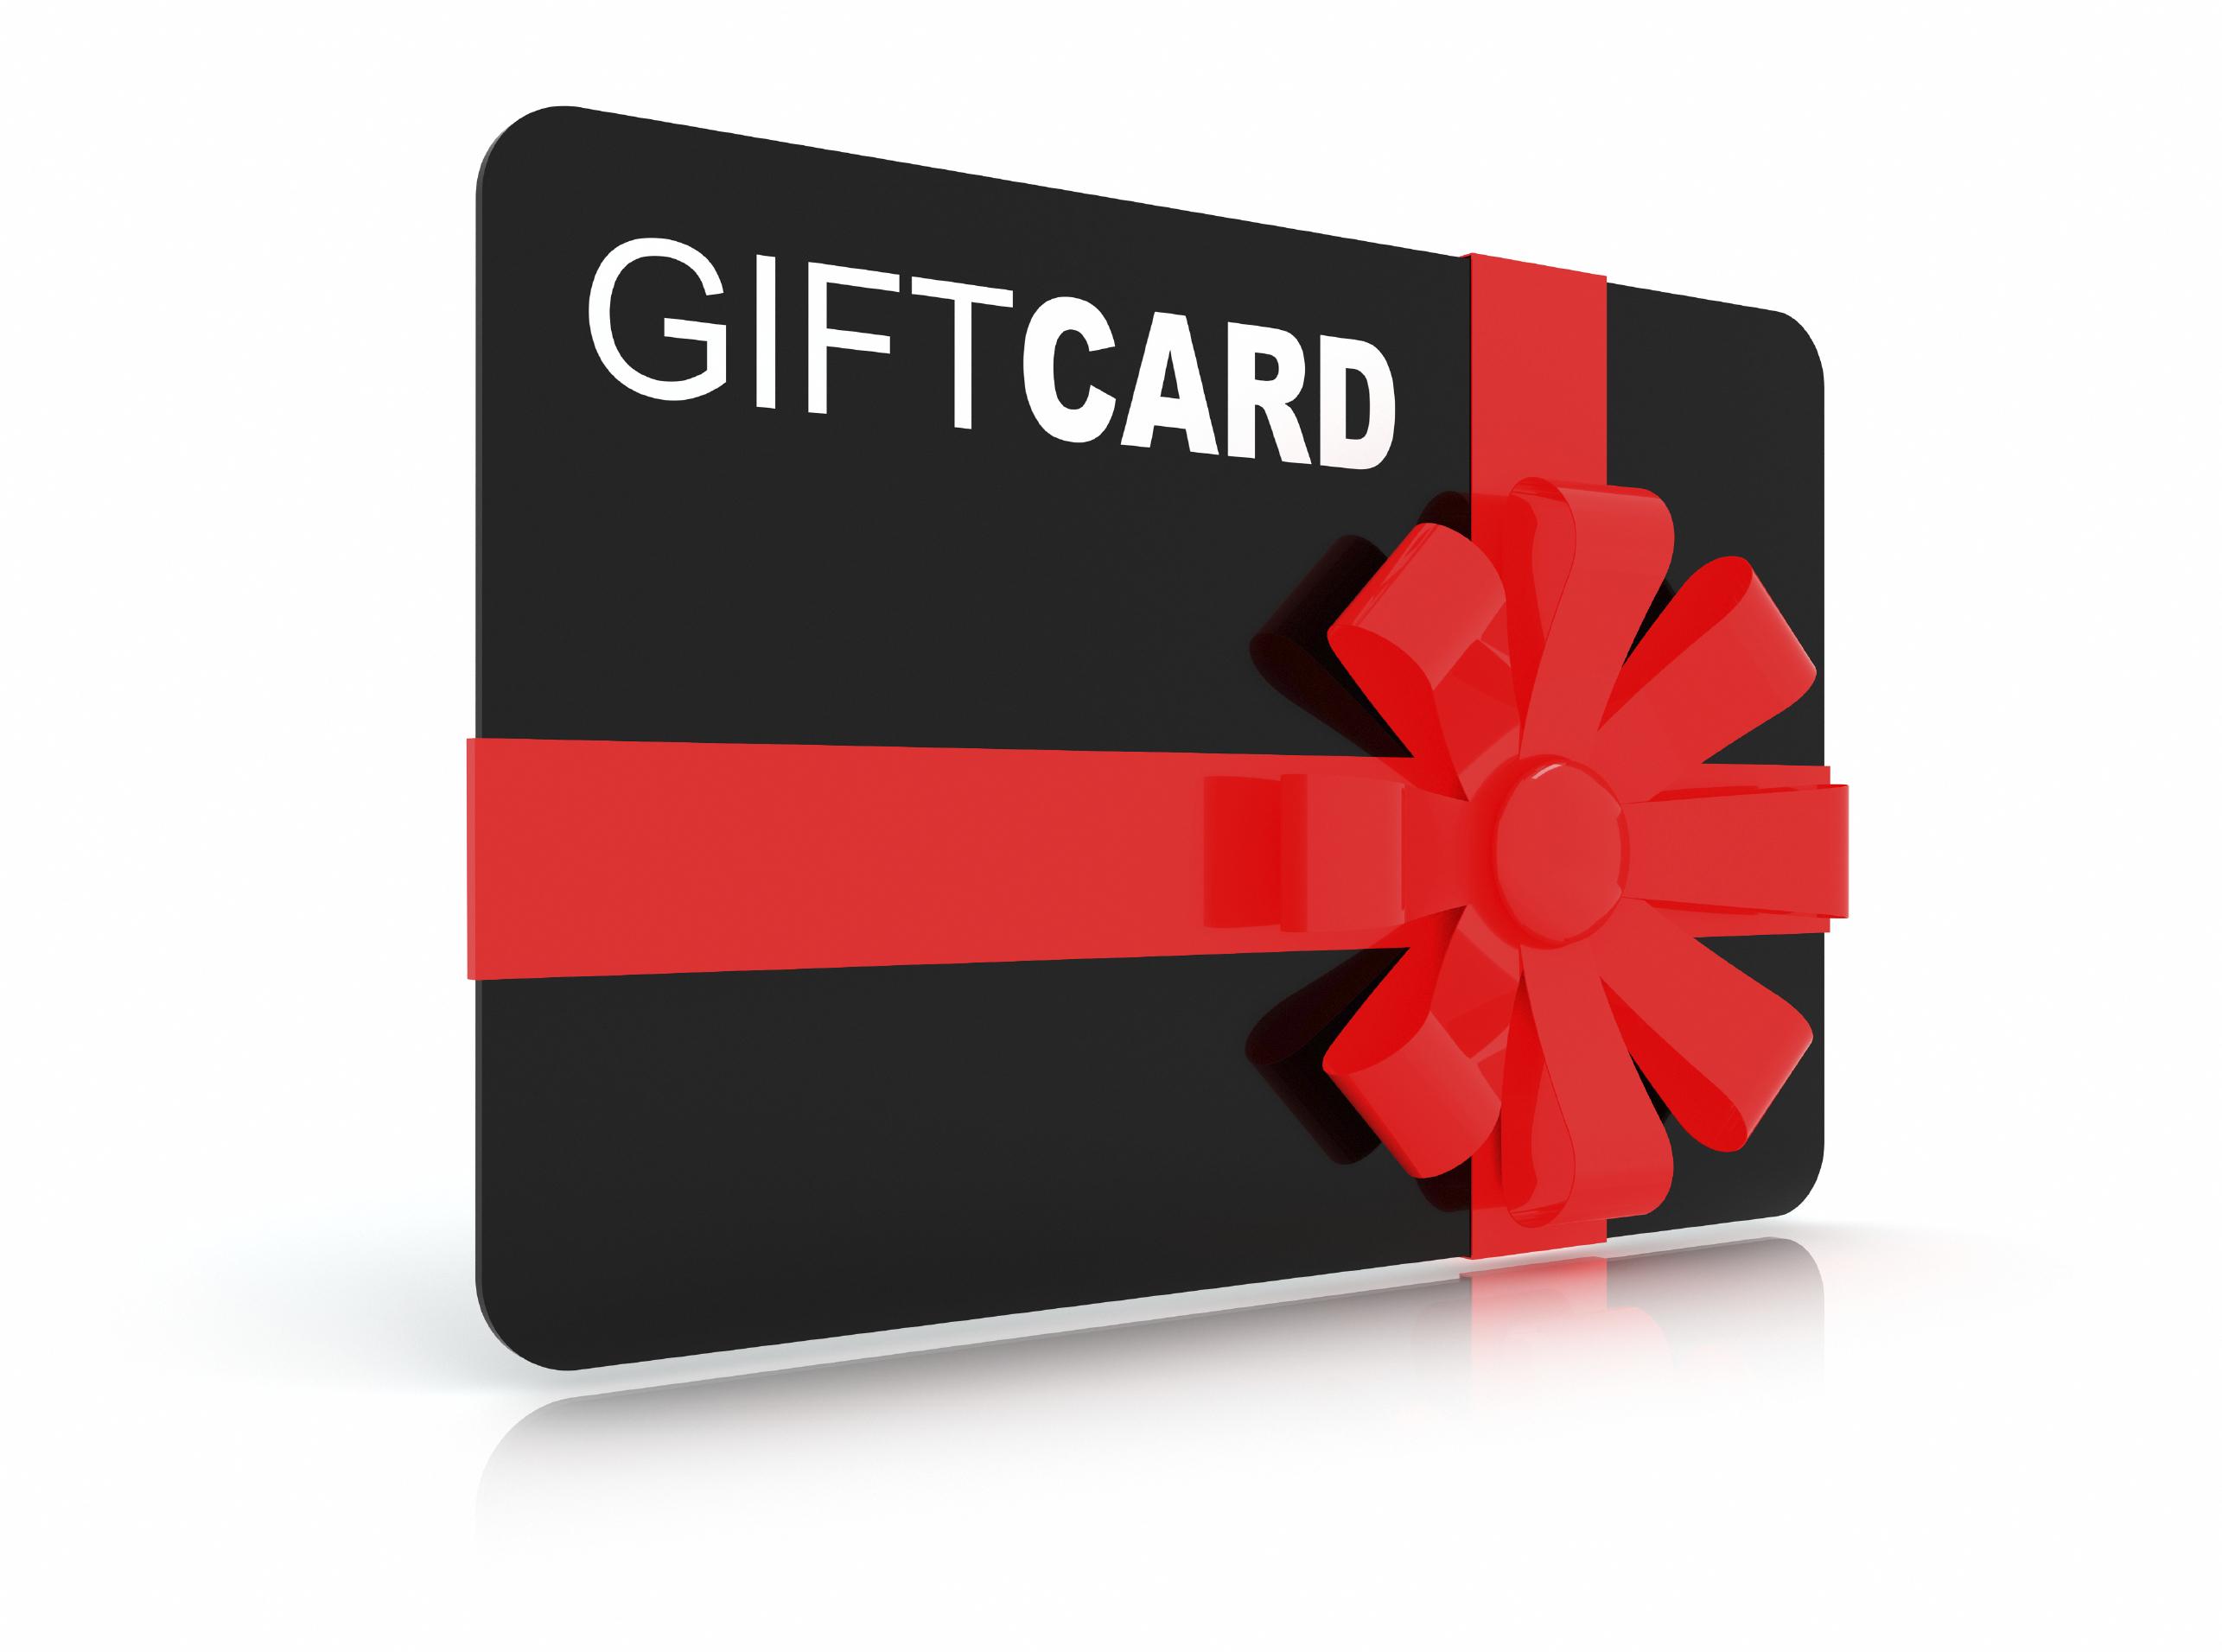 Ikebana Gift Card - $25.00 Image